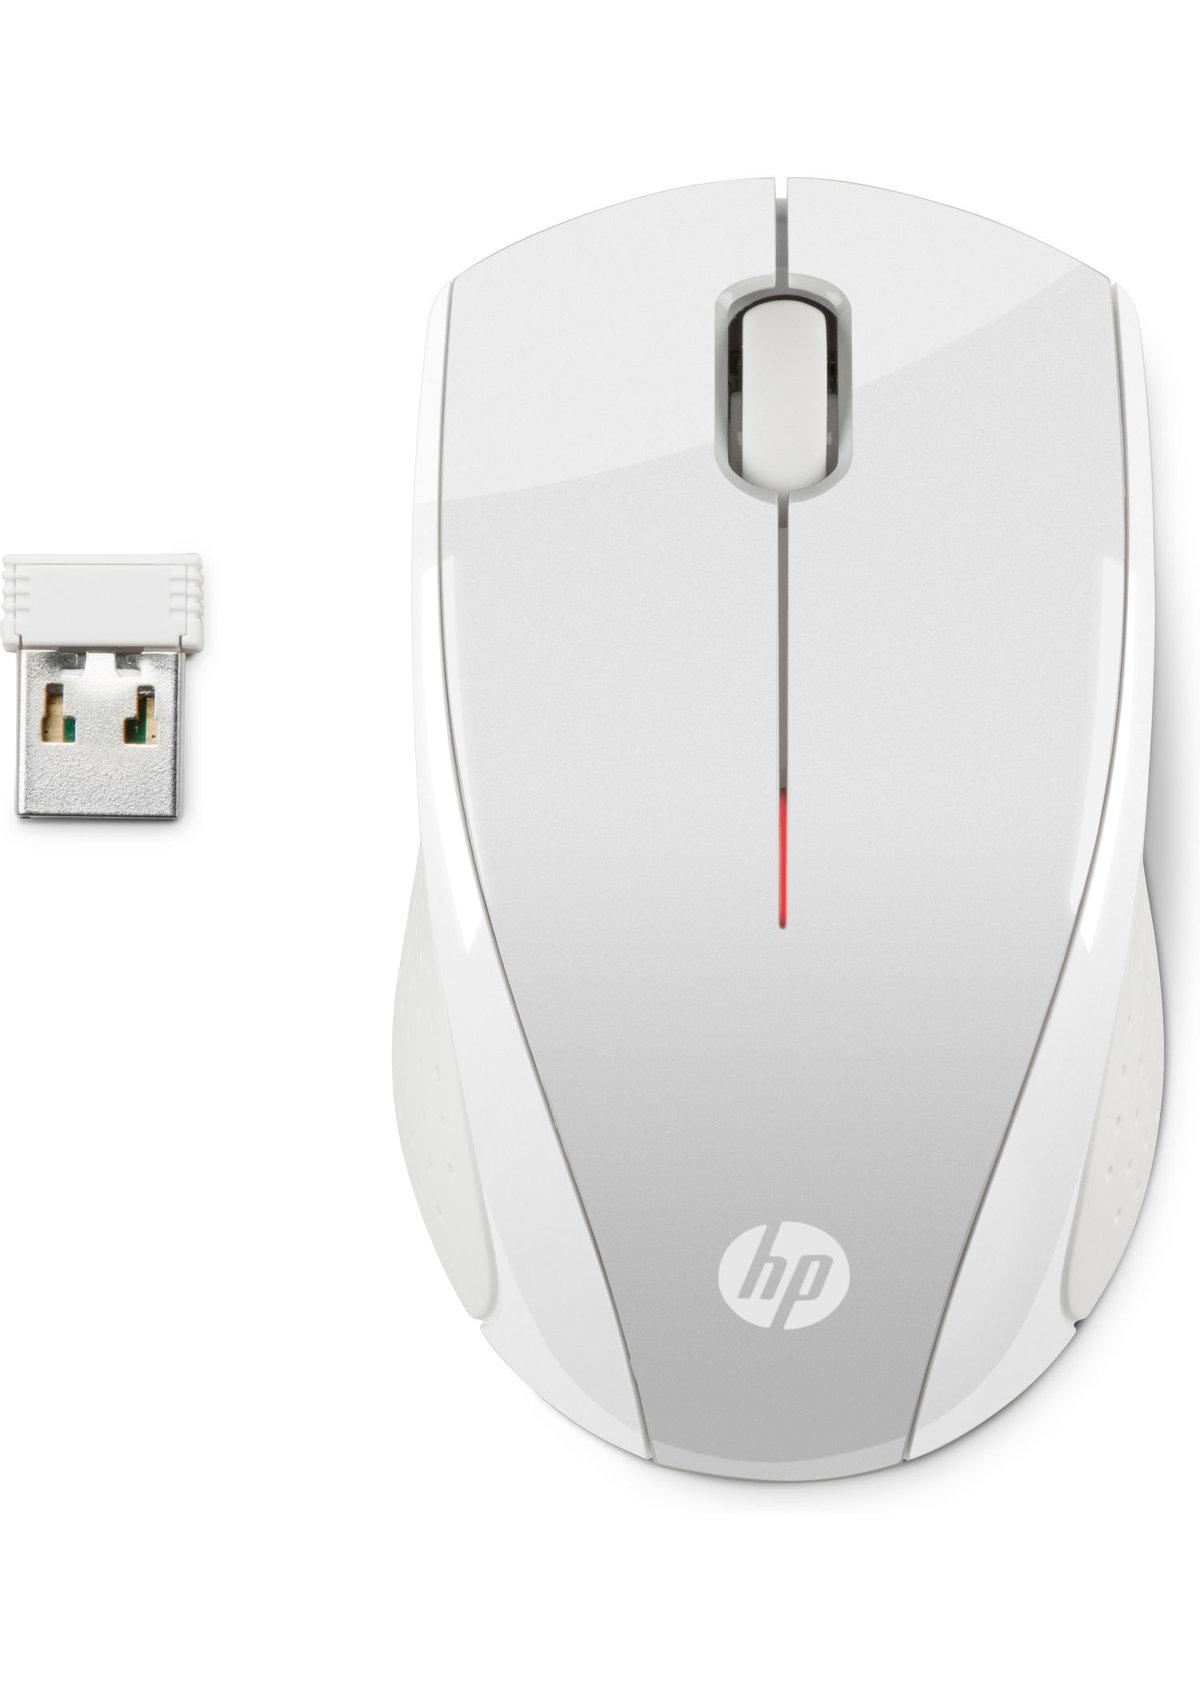 HP X3000 - Mus - optisk - 3 knappar - trådlös - 2.4 GHz - trådlös USB- e344b2440ffb4